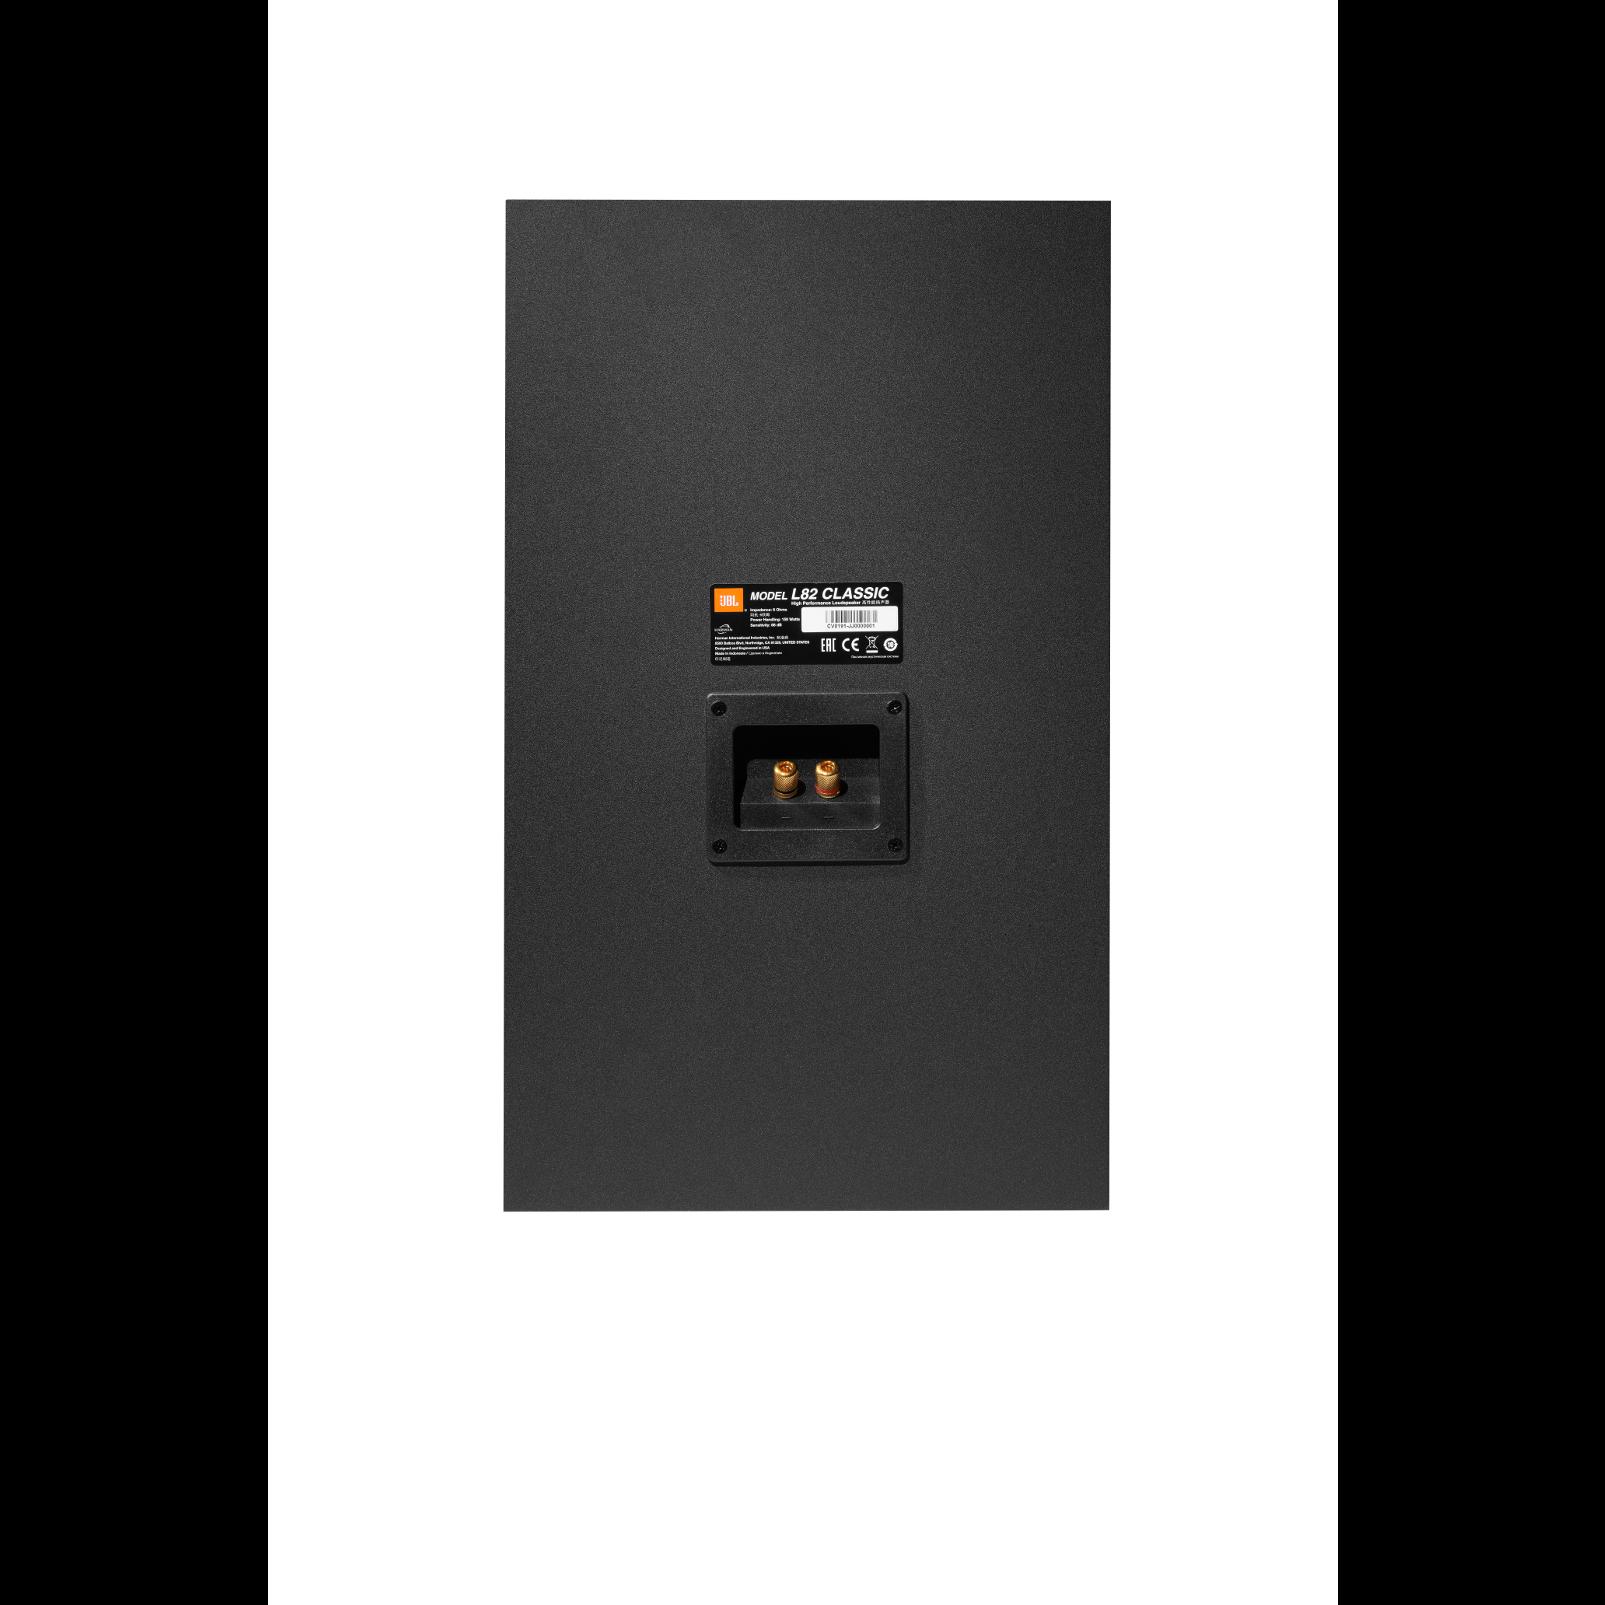 "L82 Classic - Black - 8"" (200mm) 2-way Bookshelf Loudspeaker - Back"